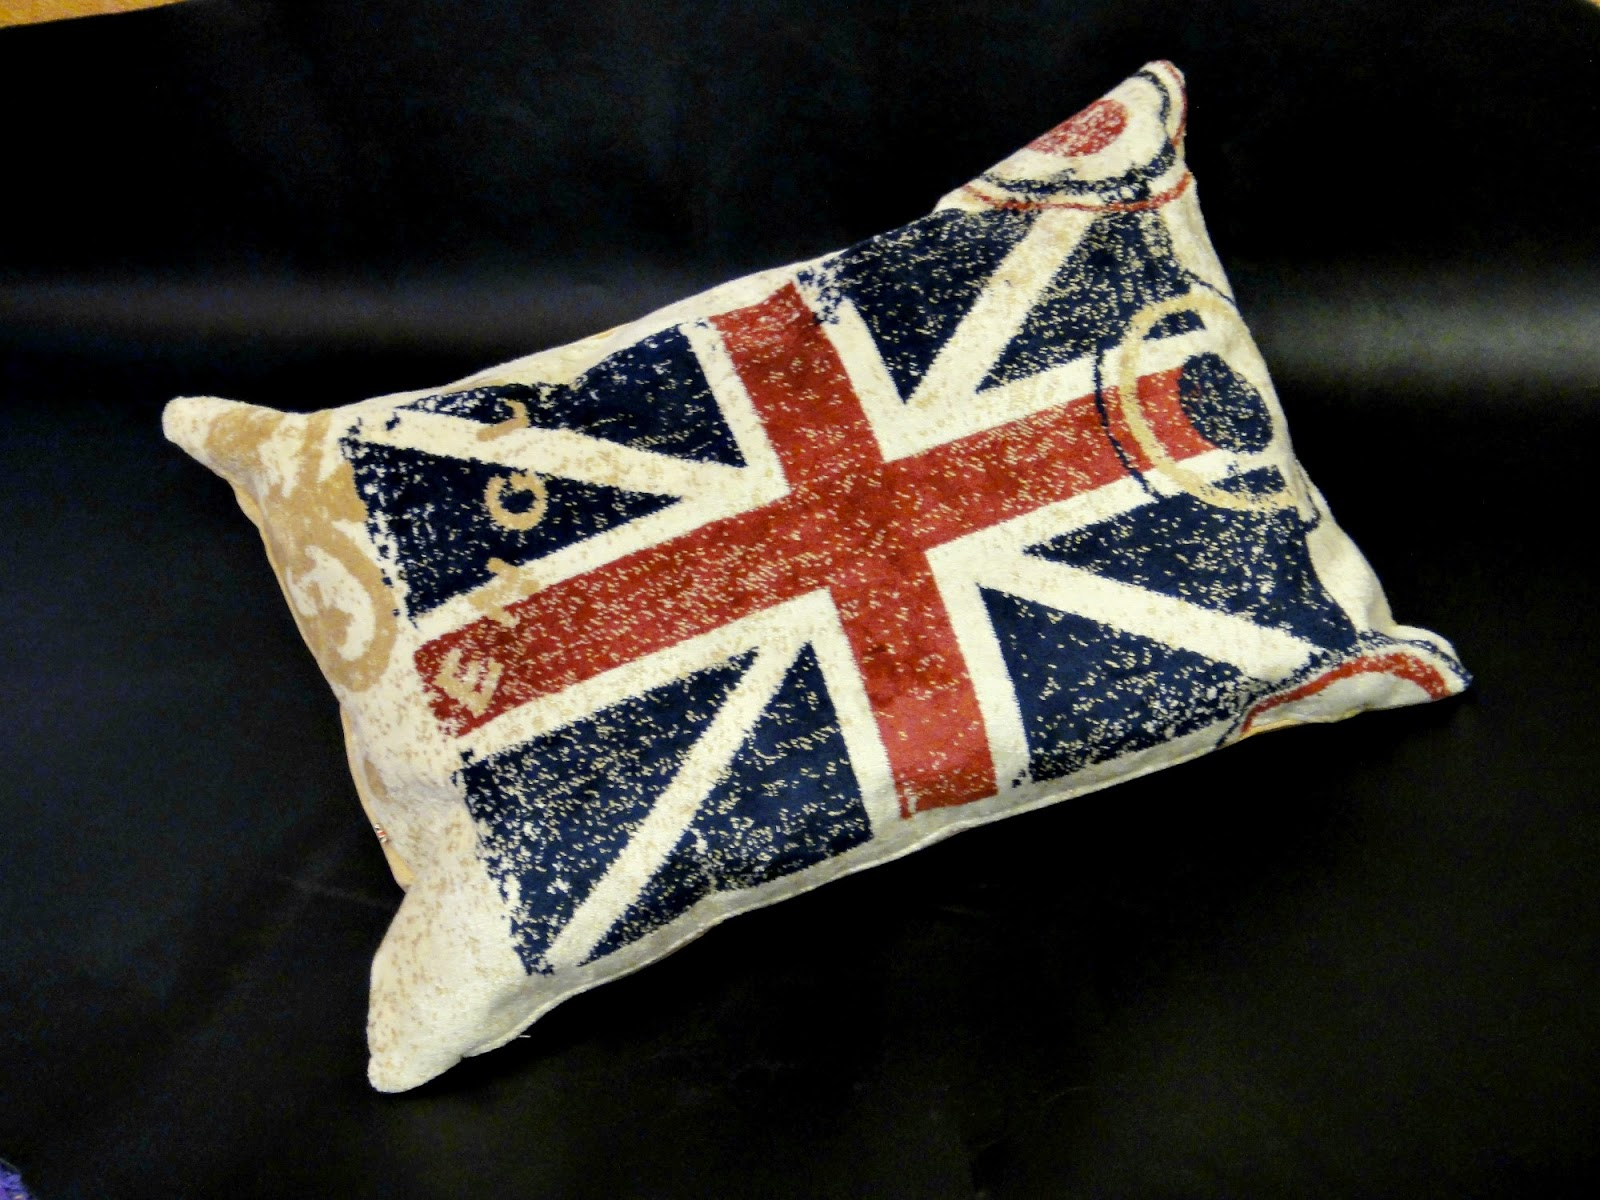 Диванные подушки: Английский флаг, Британский флаг - подушки в машину